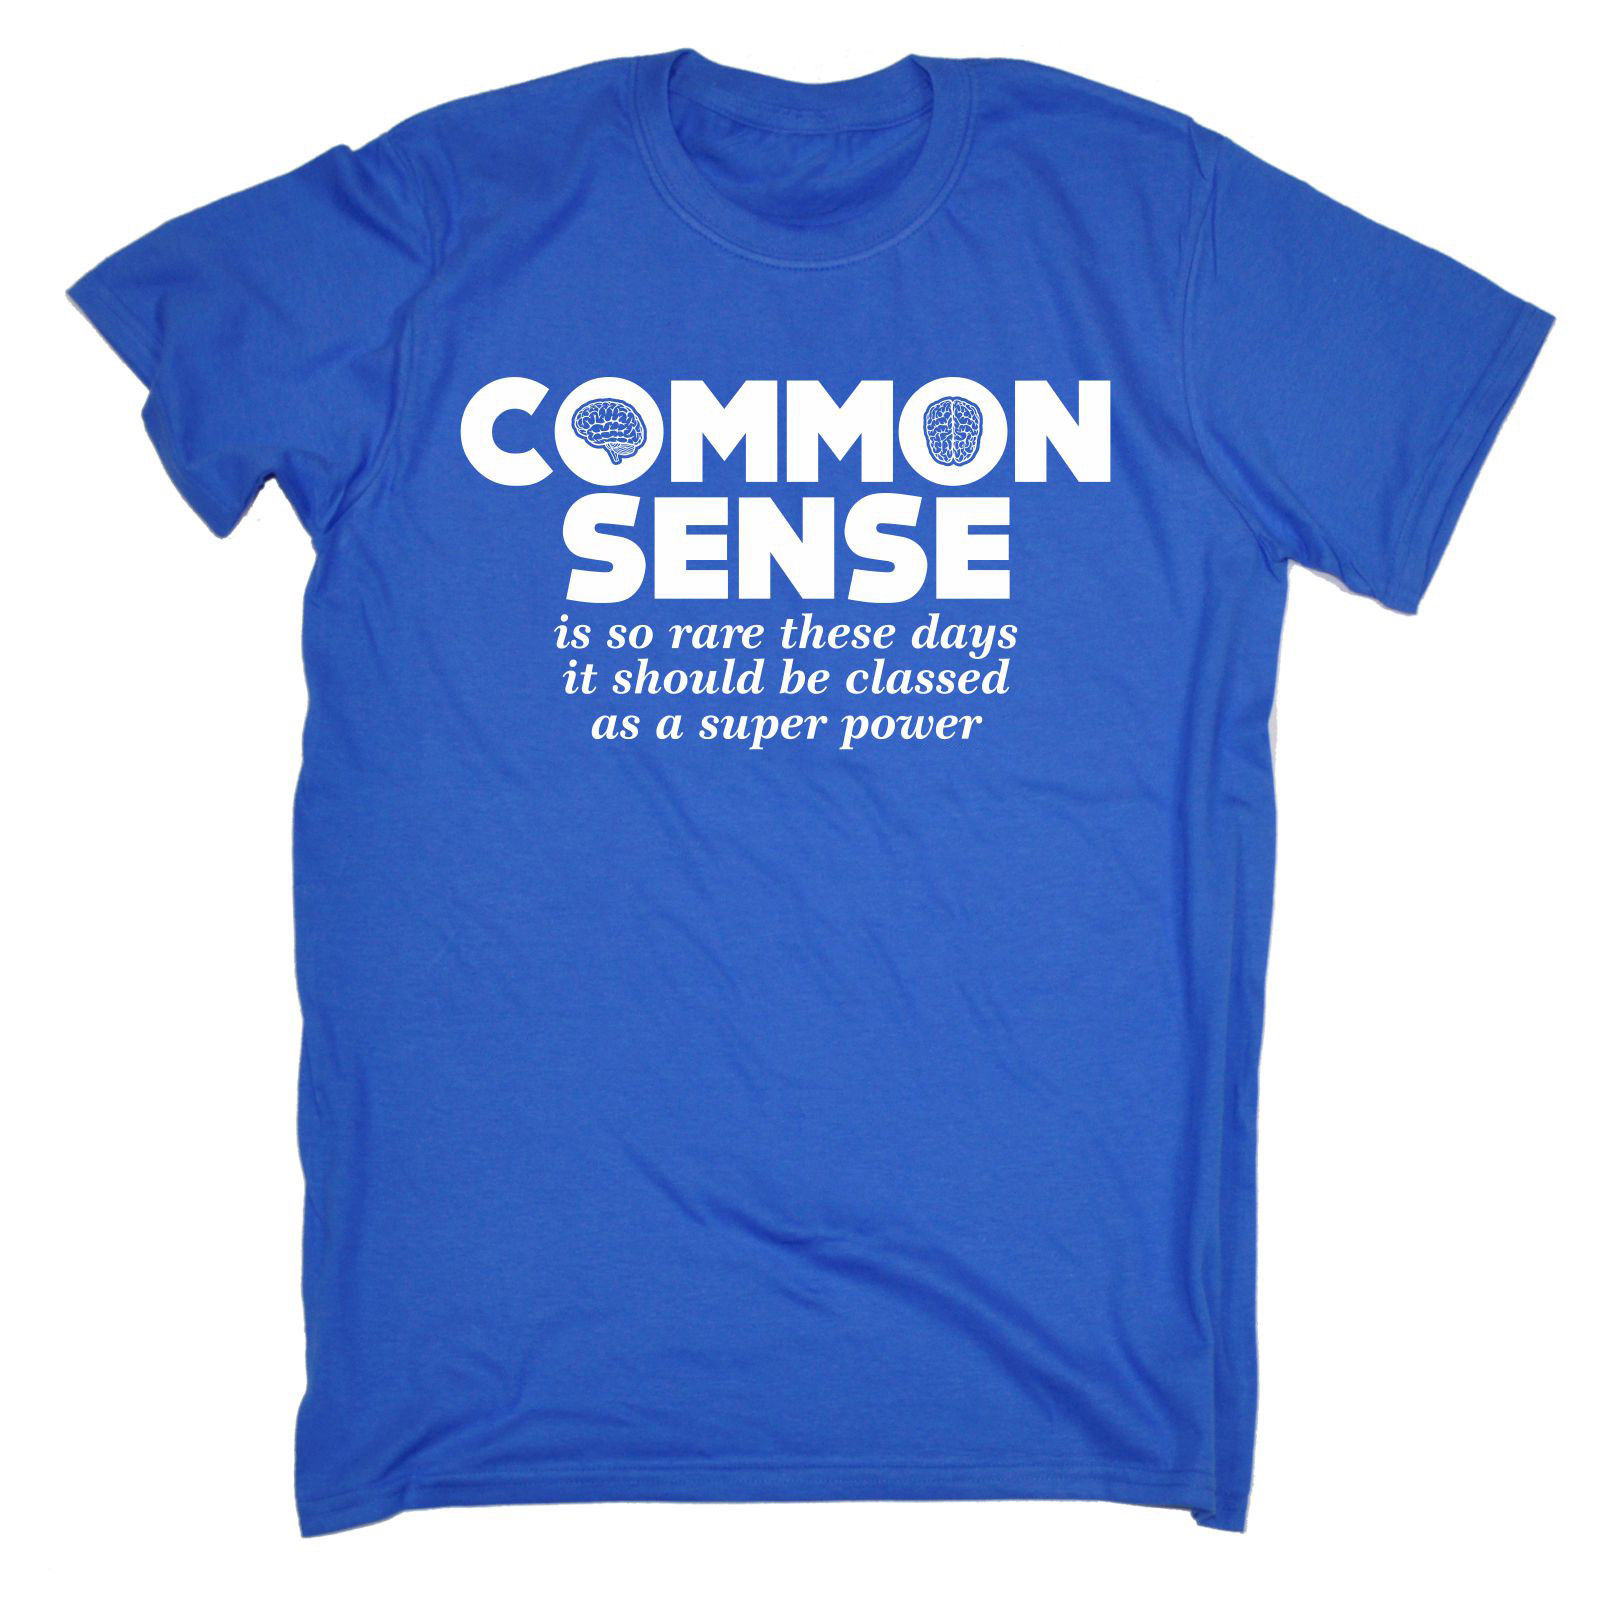 Common Sense Is So Rare These Days T-SHIRT Sarcasm Comics Funny Gift Birthday